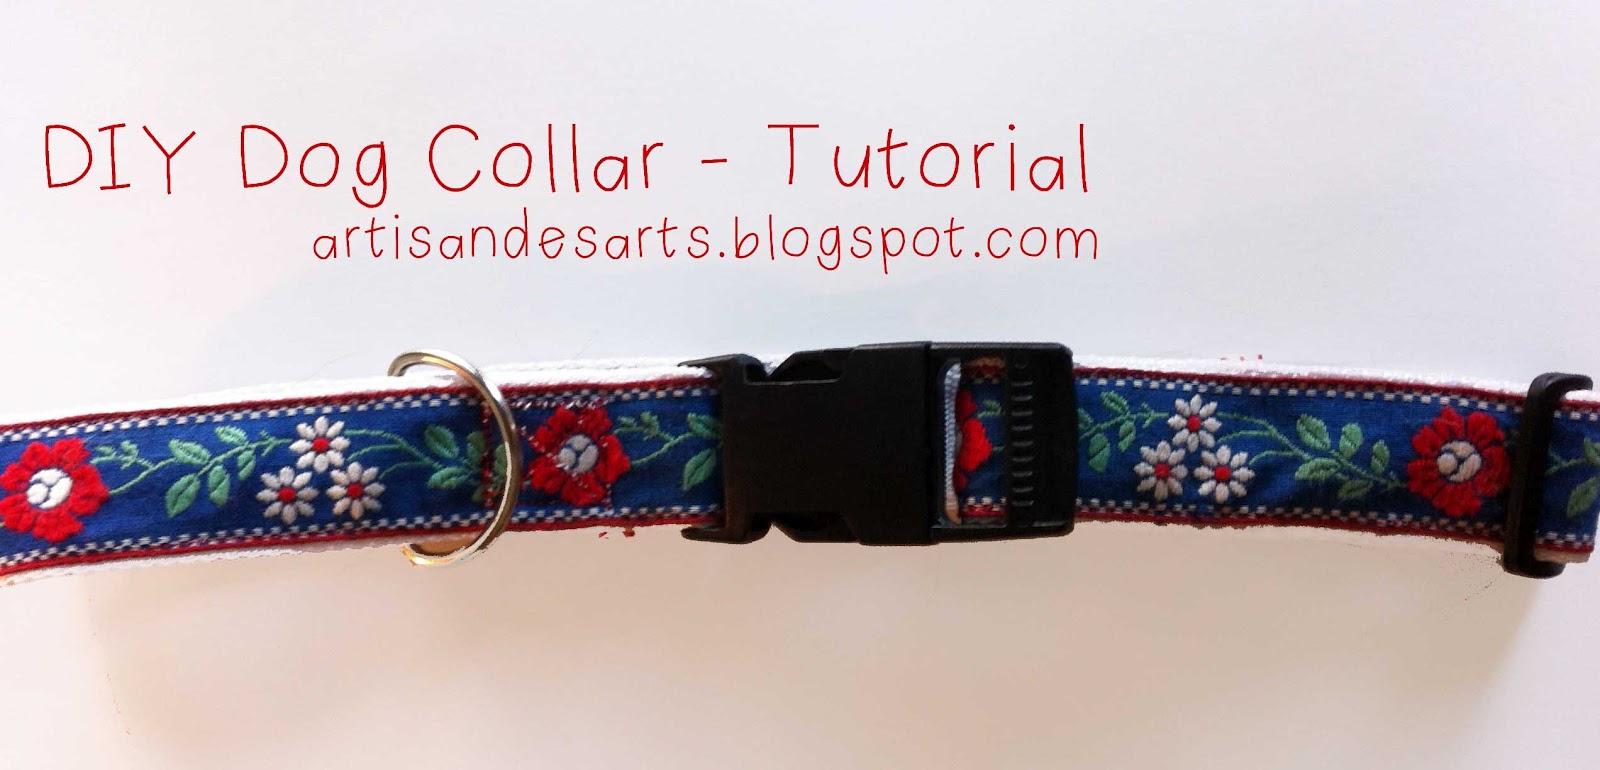 Crafted home diy dog collar tutorial diy dog collar tutorial jeuxipadfo Gallery